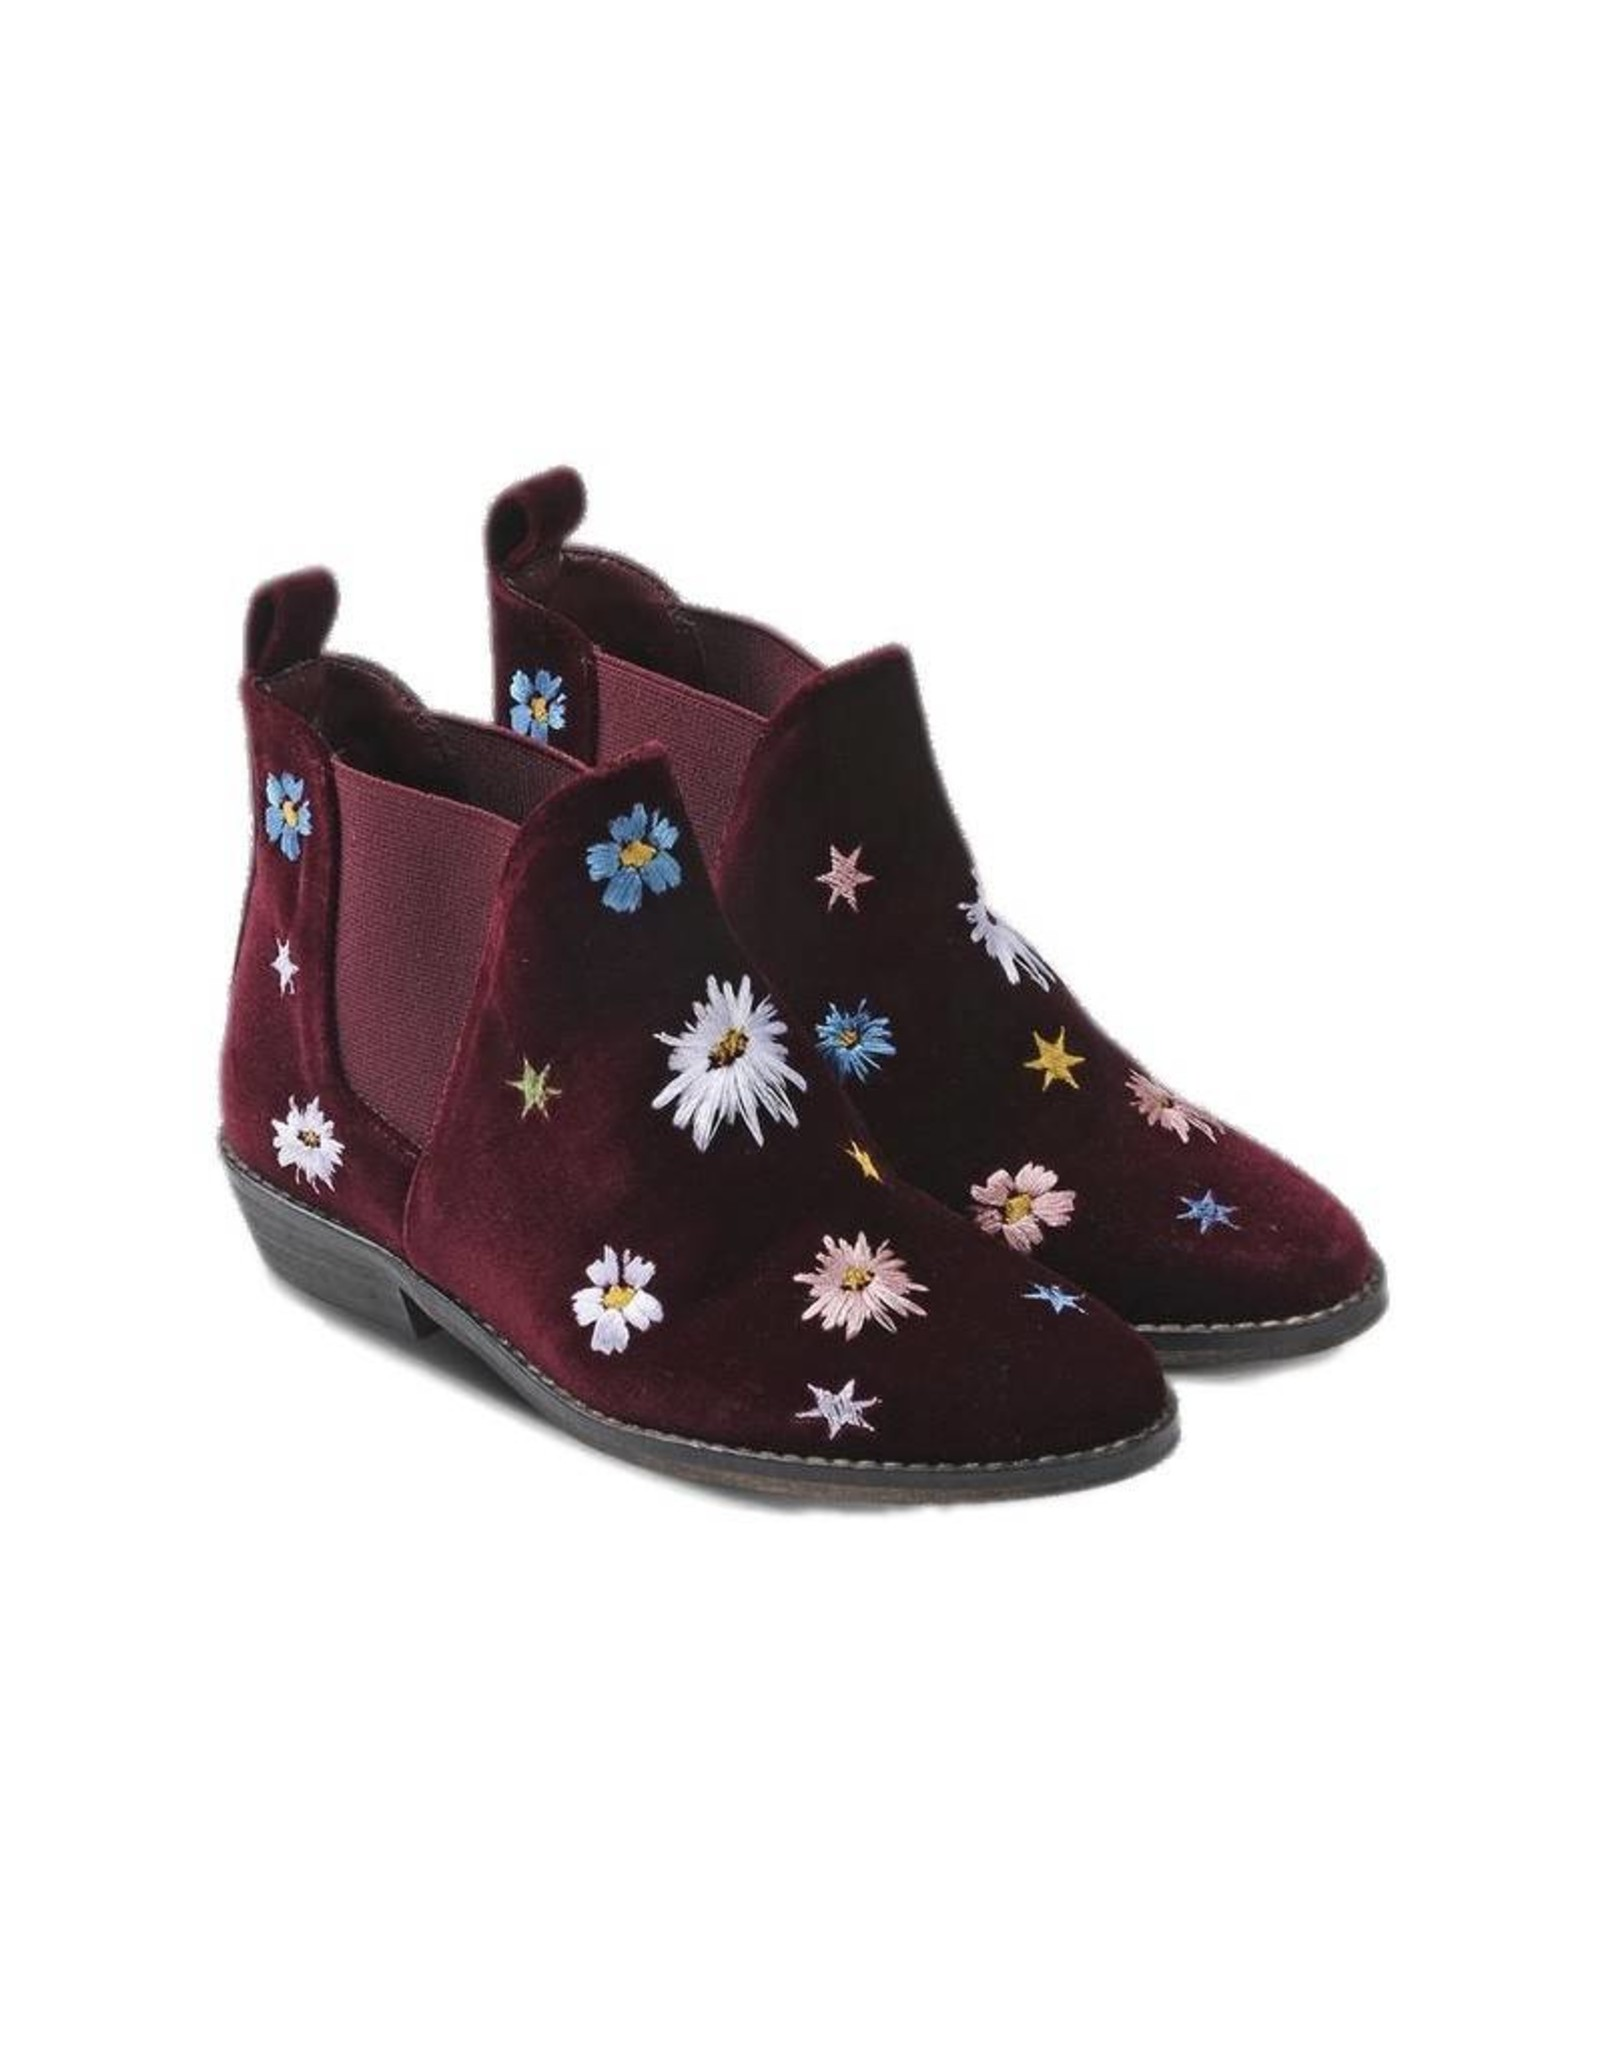 Stella McCartney Lily flowers